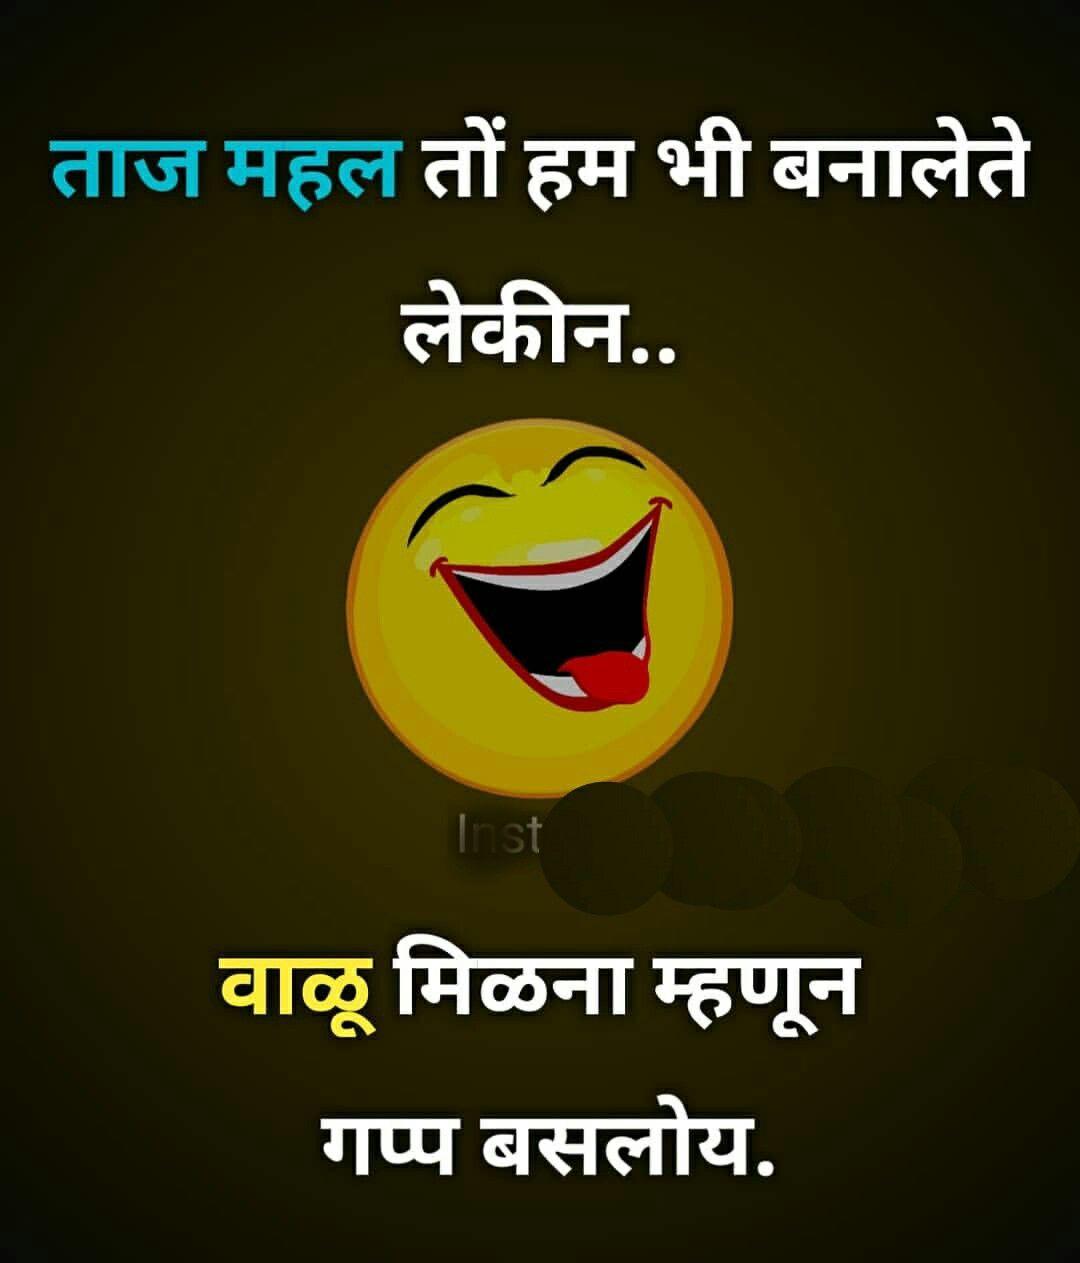 Pin By Appa Jadhav On Marathi Funny Tea Quotes Funny Comedy Quotes Funny Quotes